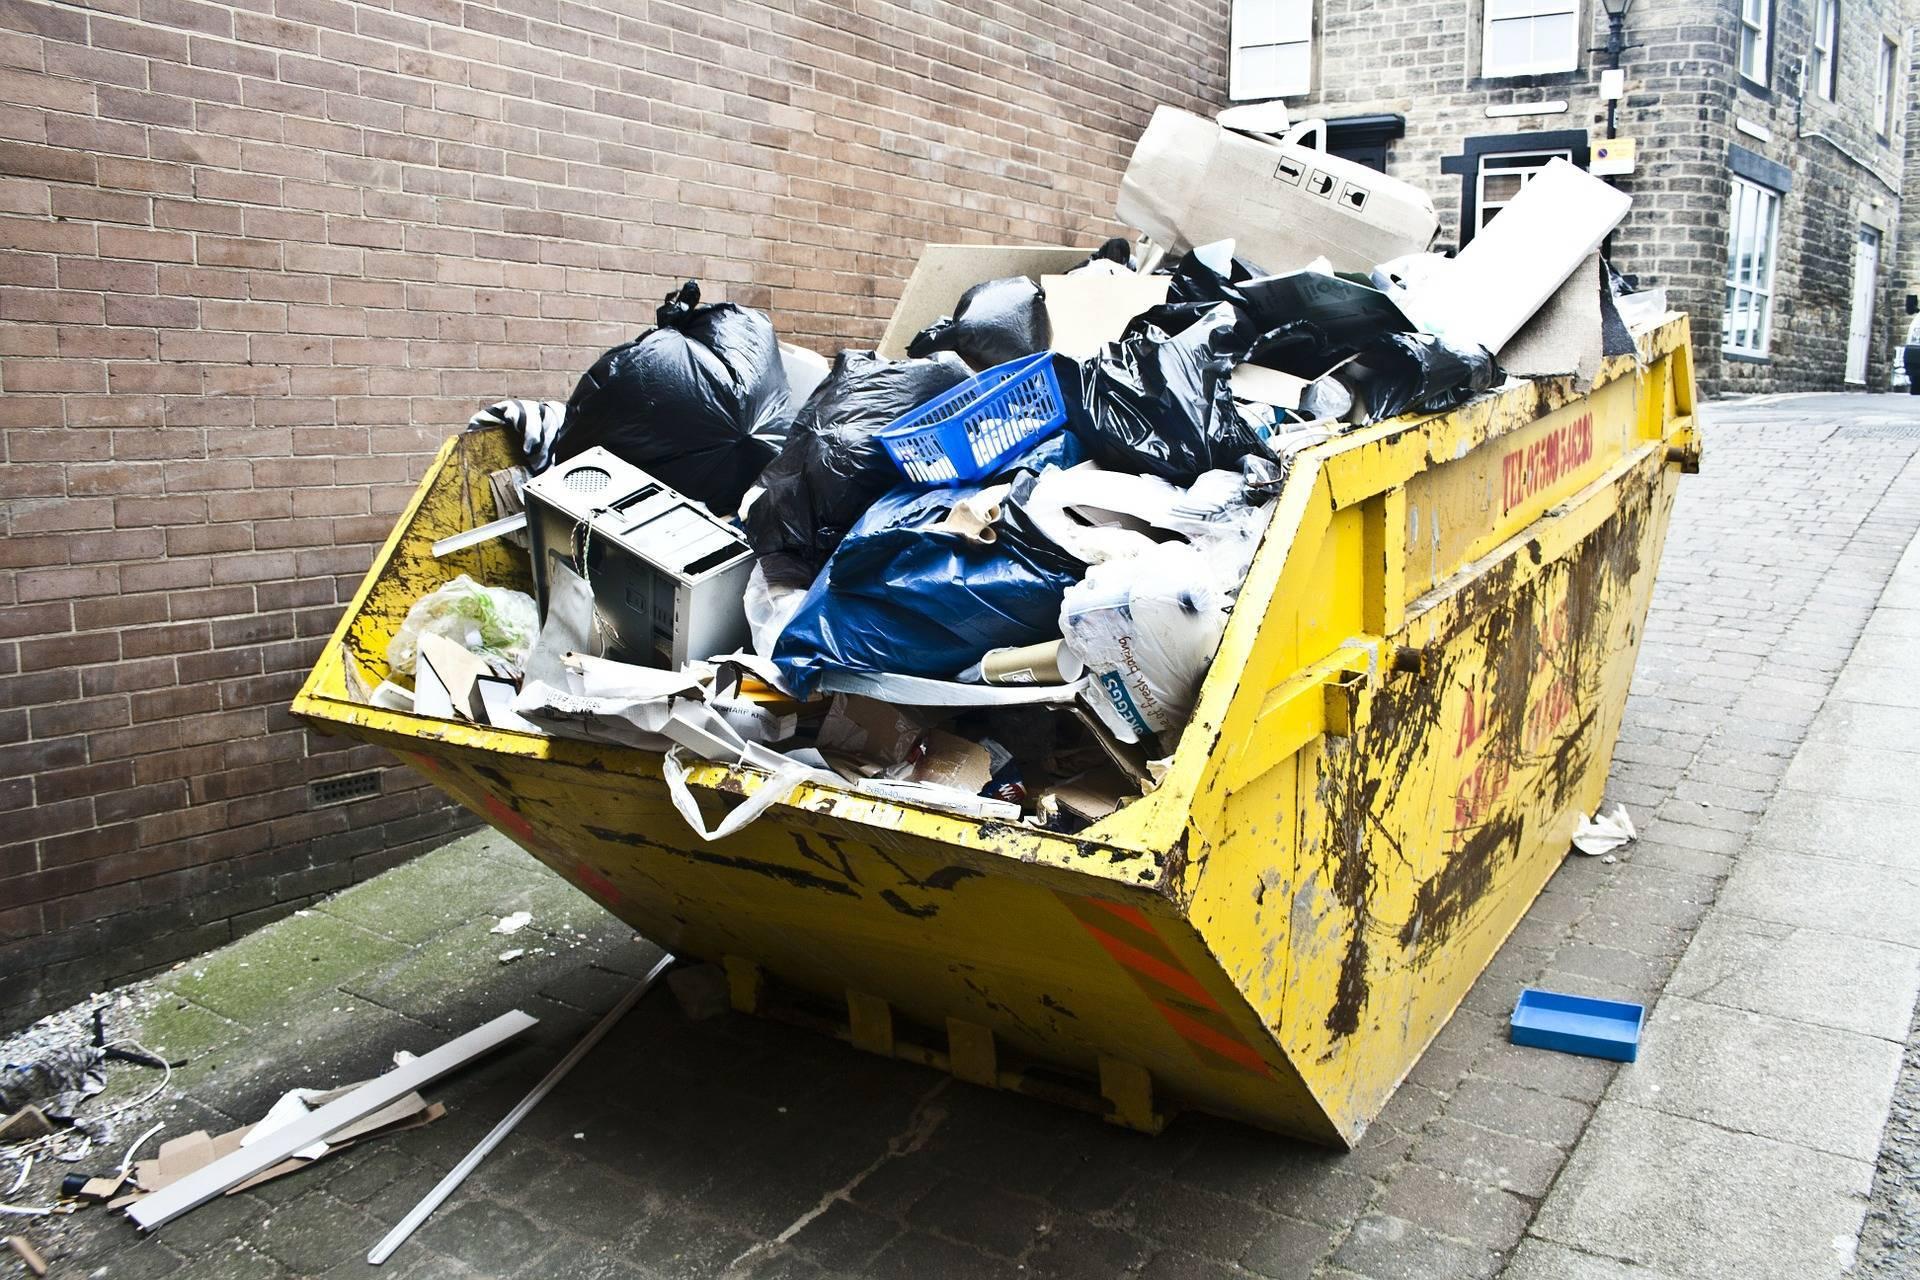 7bc6285d48b428bcd6a6_e-waste_garbage.jpg